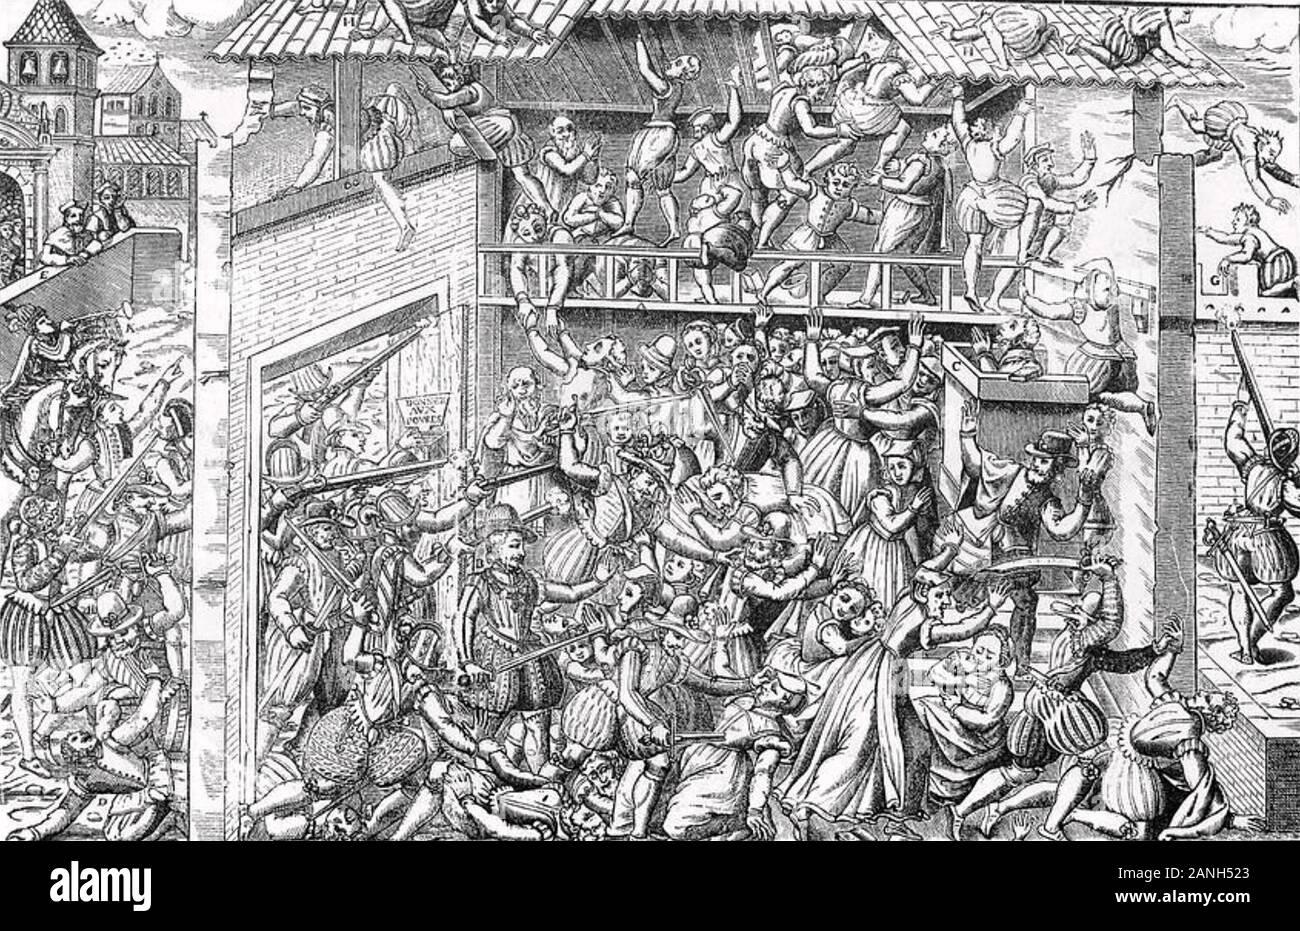 MASSACRE OF THE HUGUENOTS 1572 Stock Photo